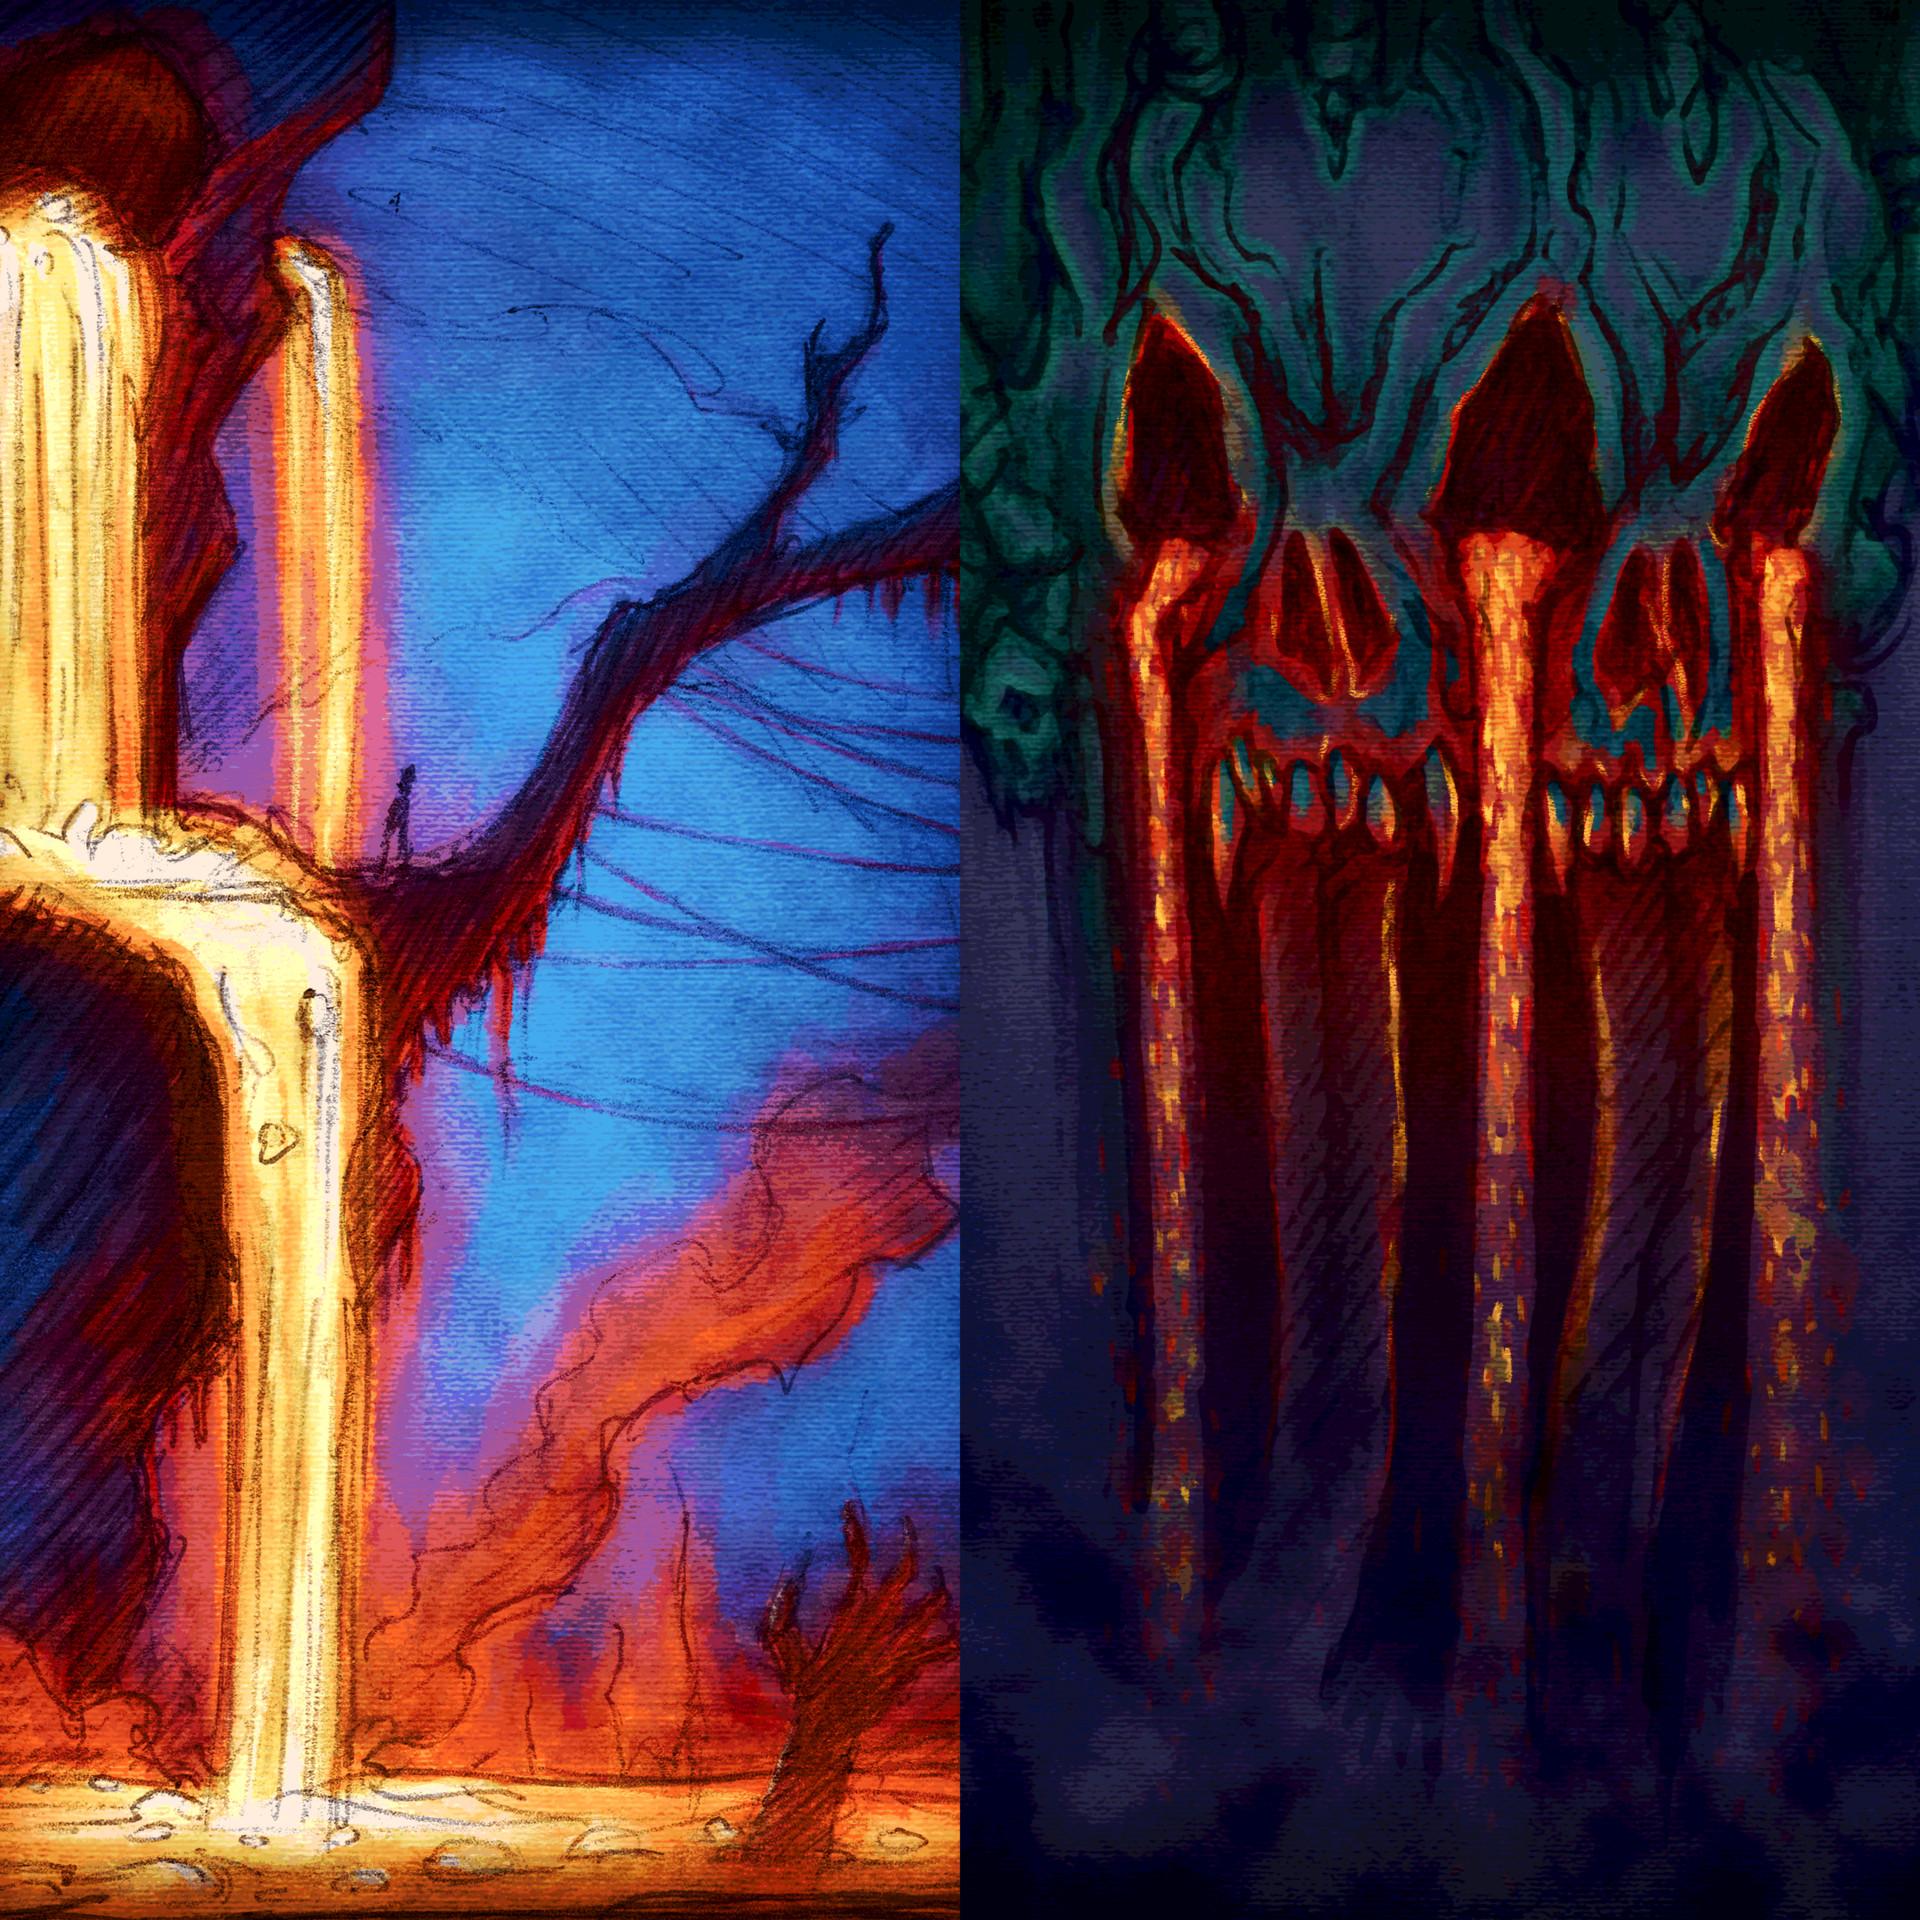 E lynx lin inferno lavafalls